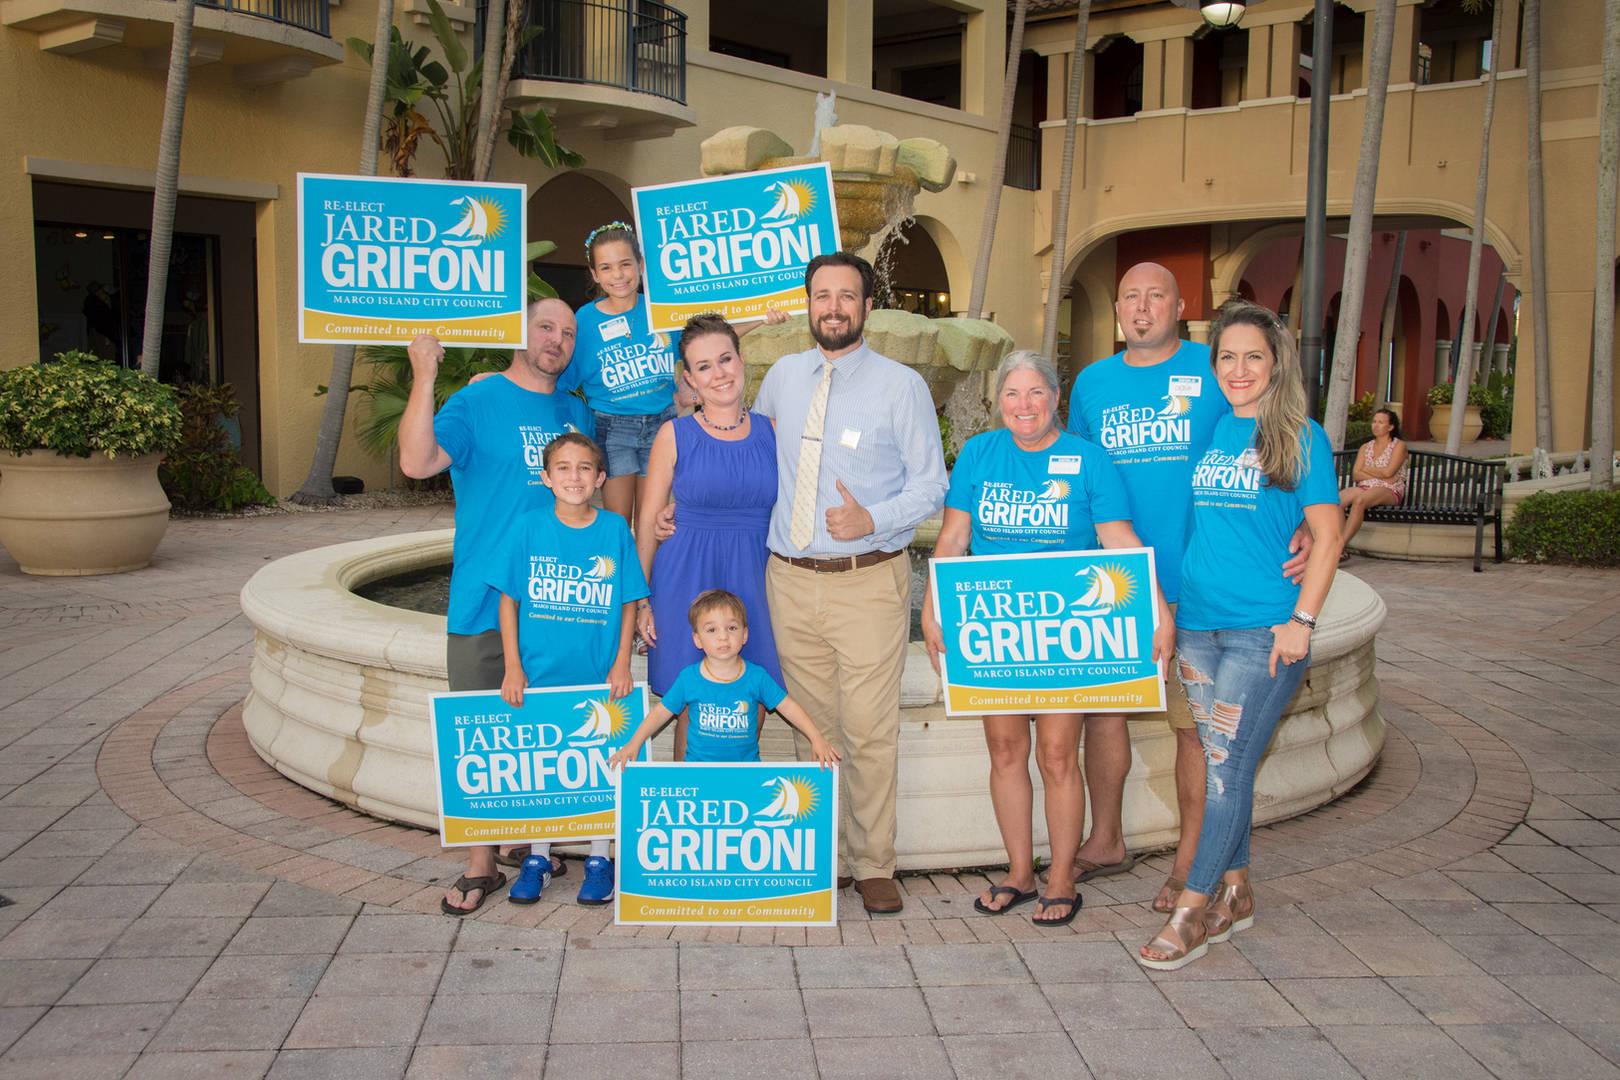 Team Grifoni Volunteers